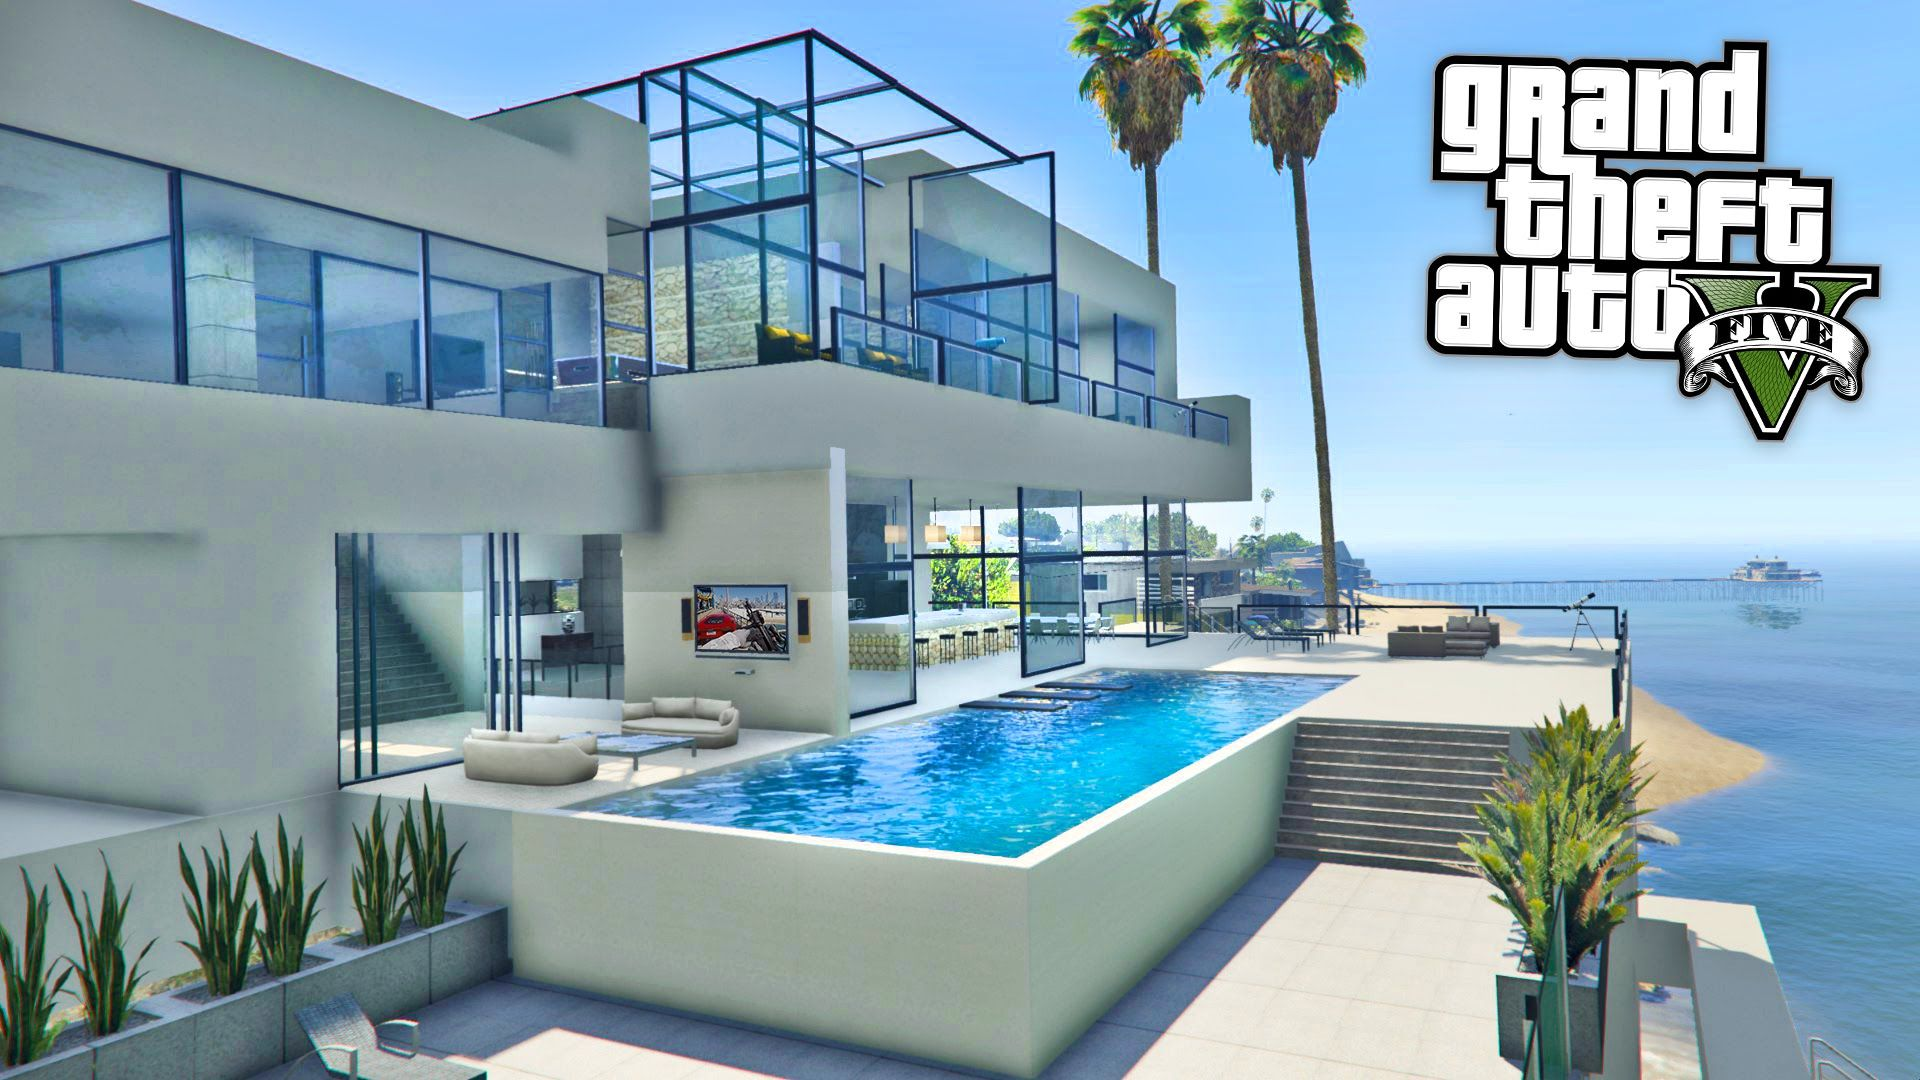 Gta 5 Mods Billionaires Mansions Mod